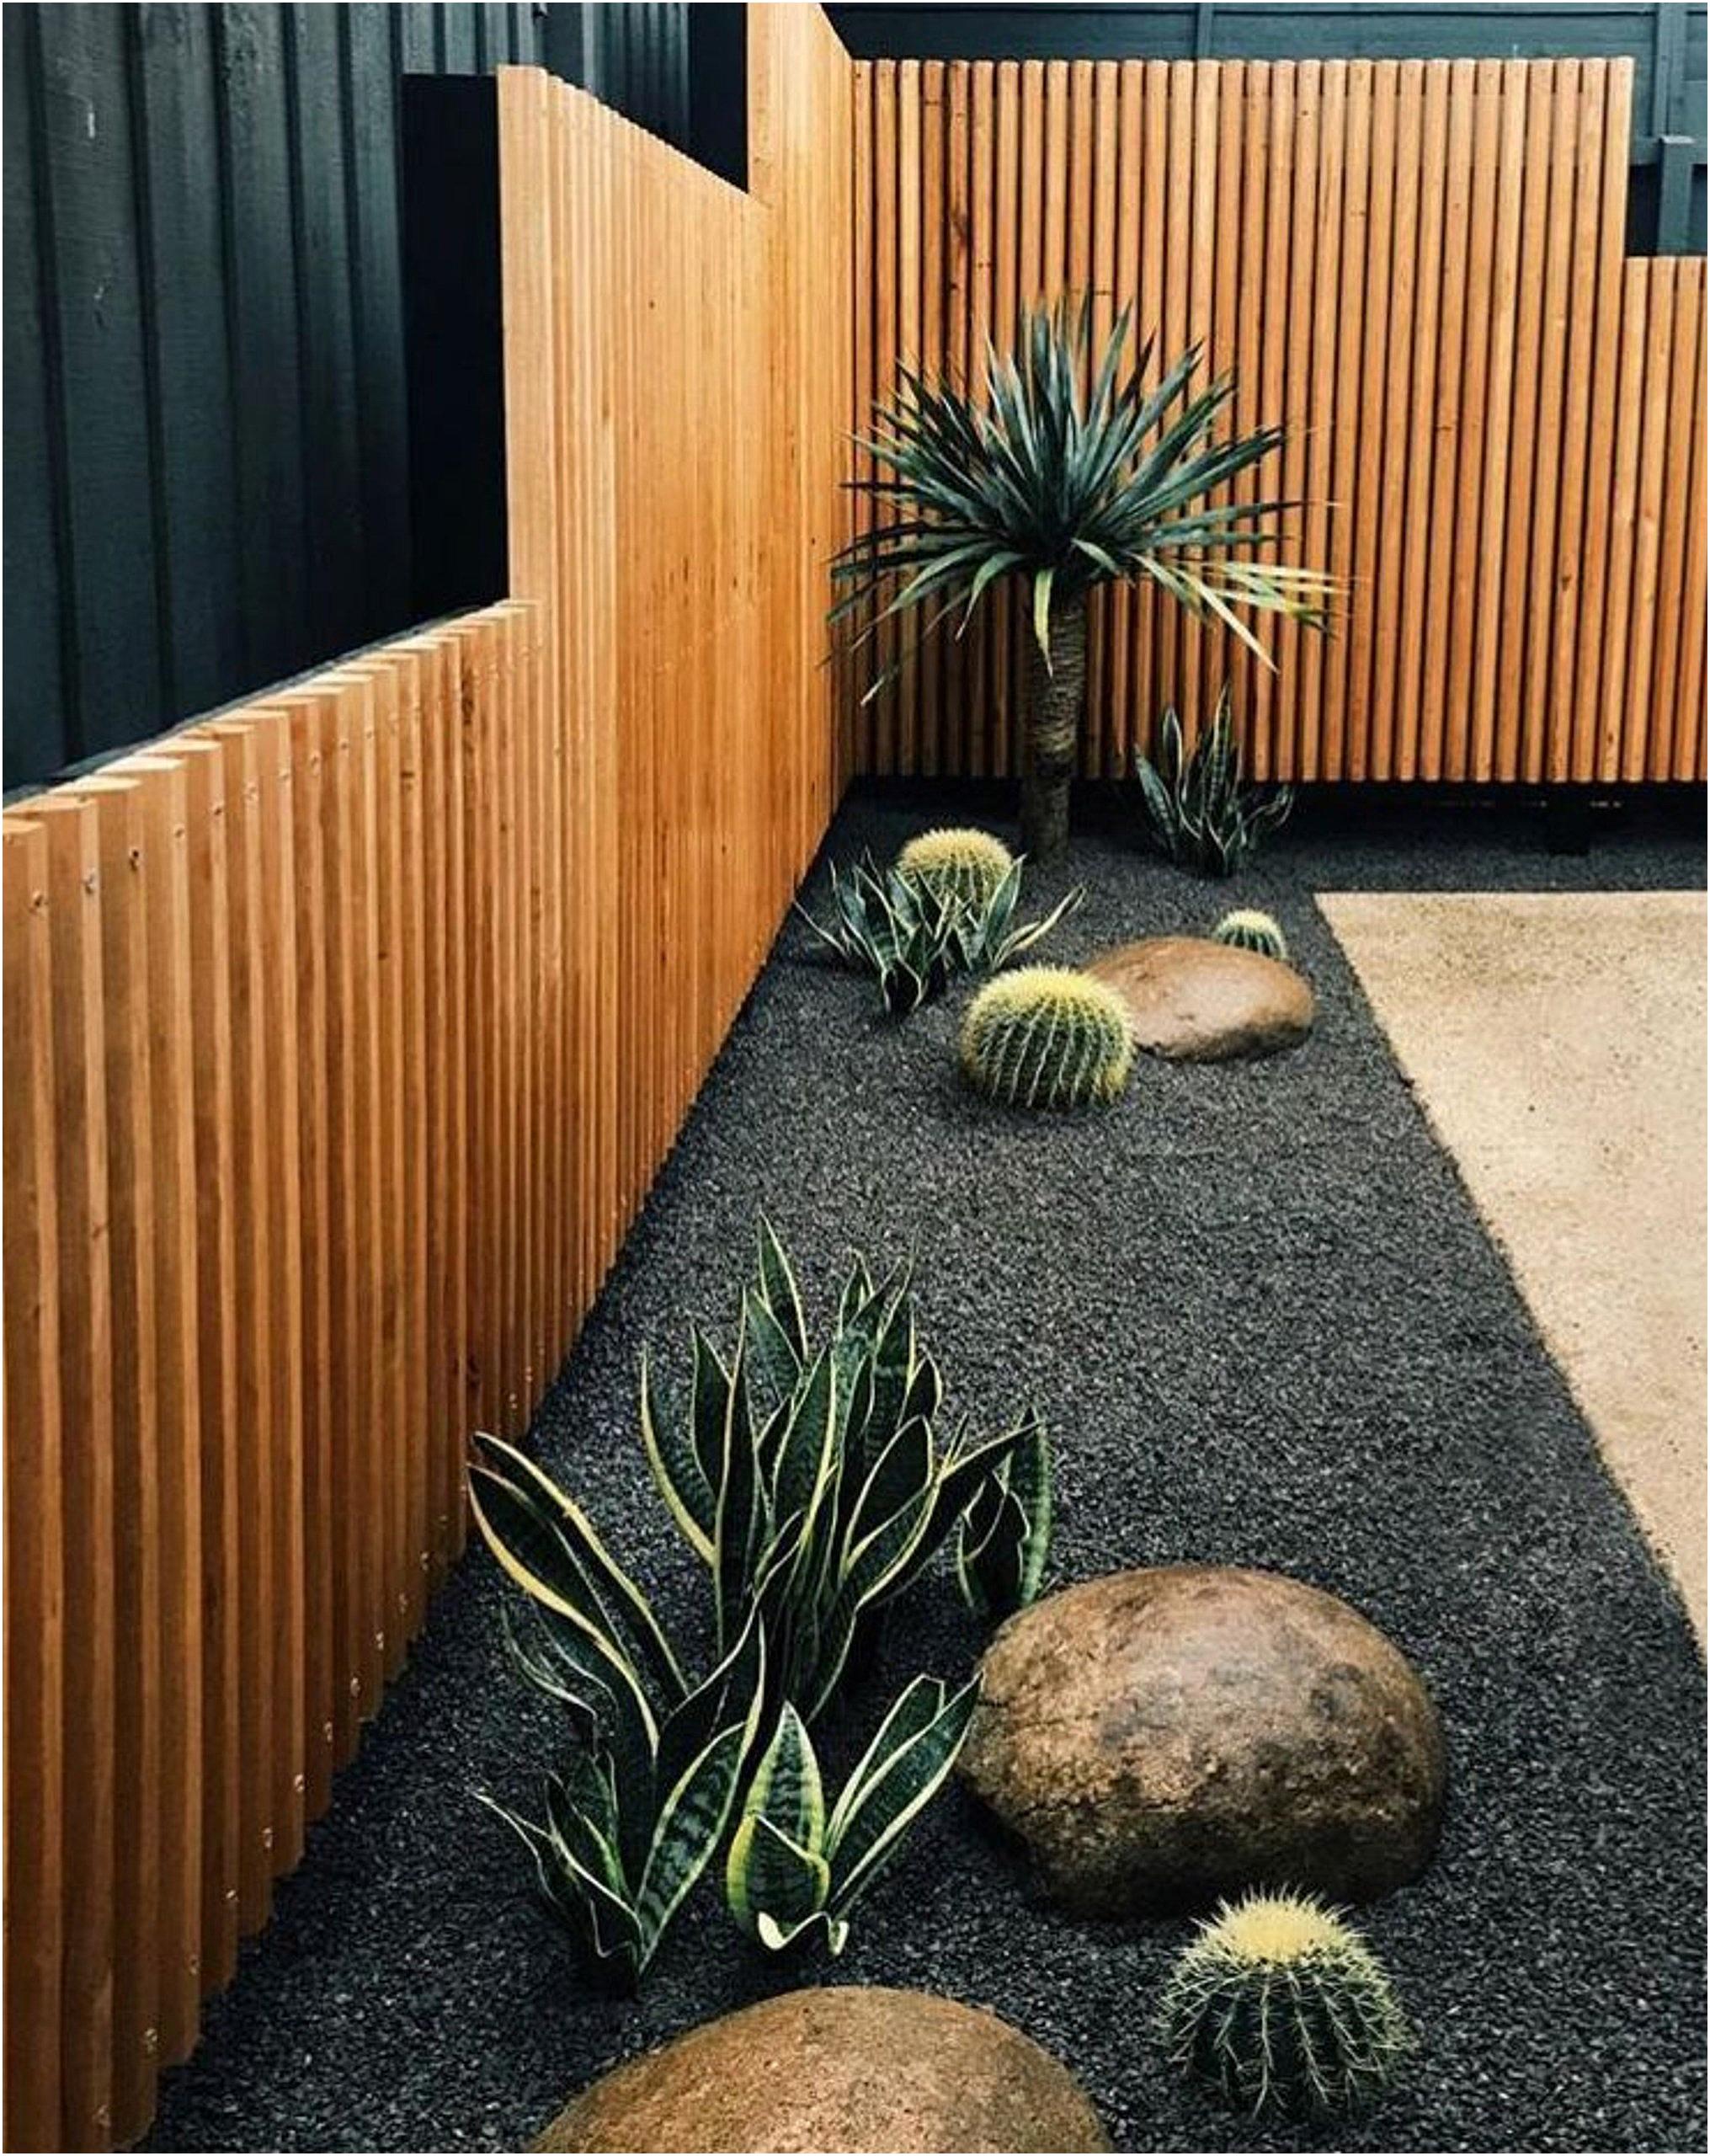 4. Place Cactus in the Corners via Simphome.com